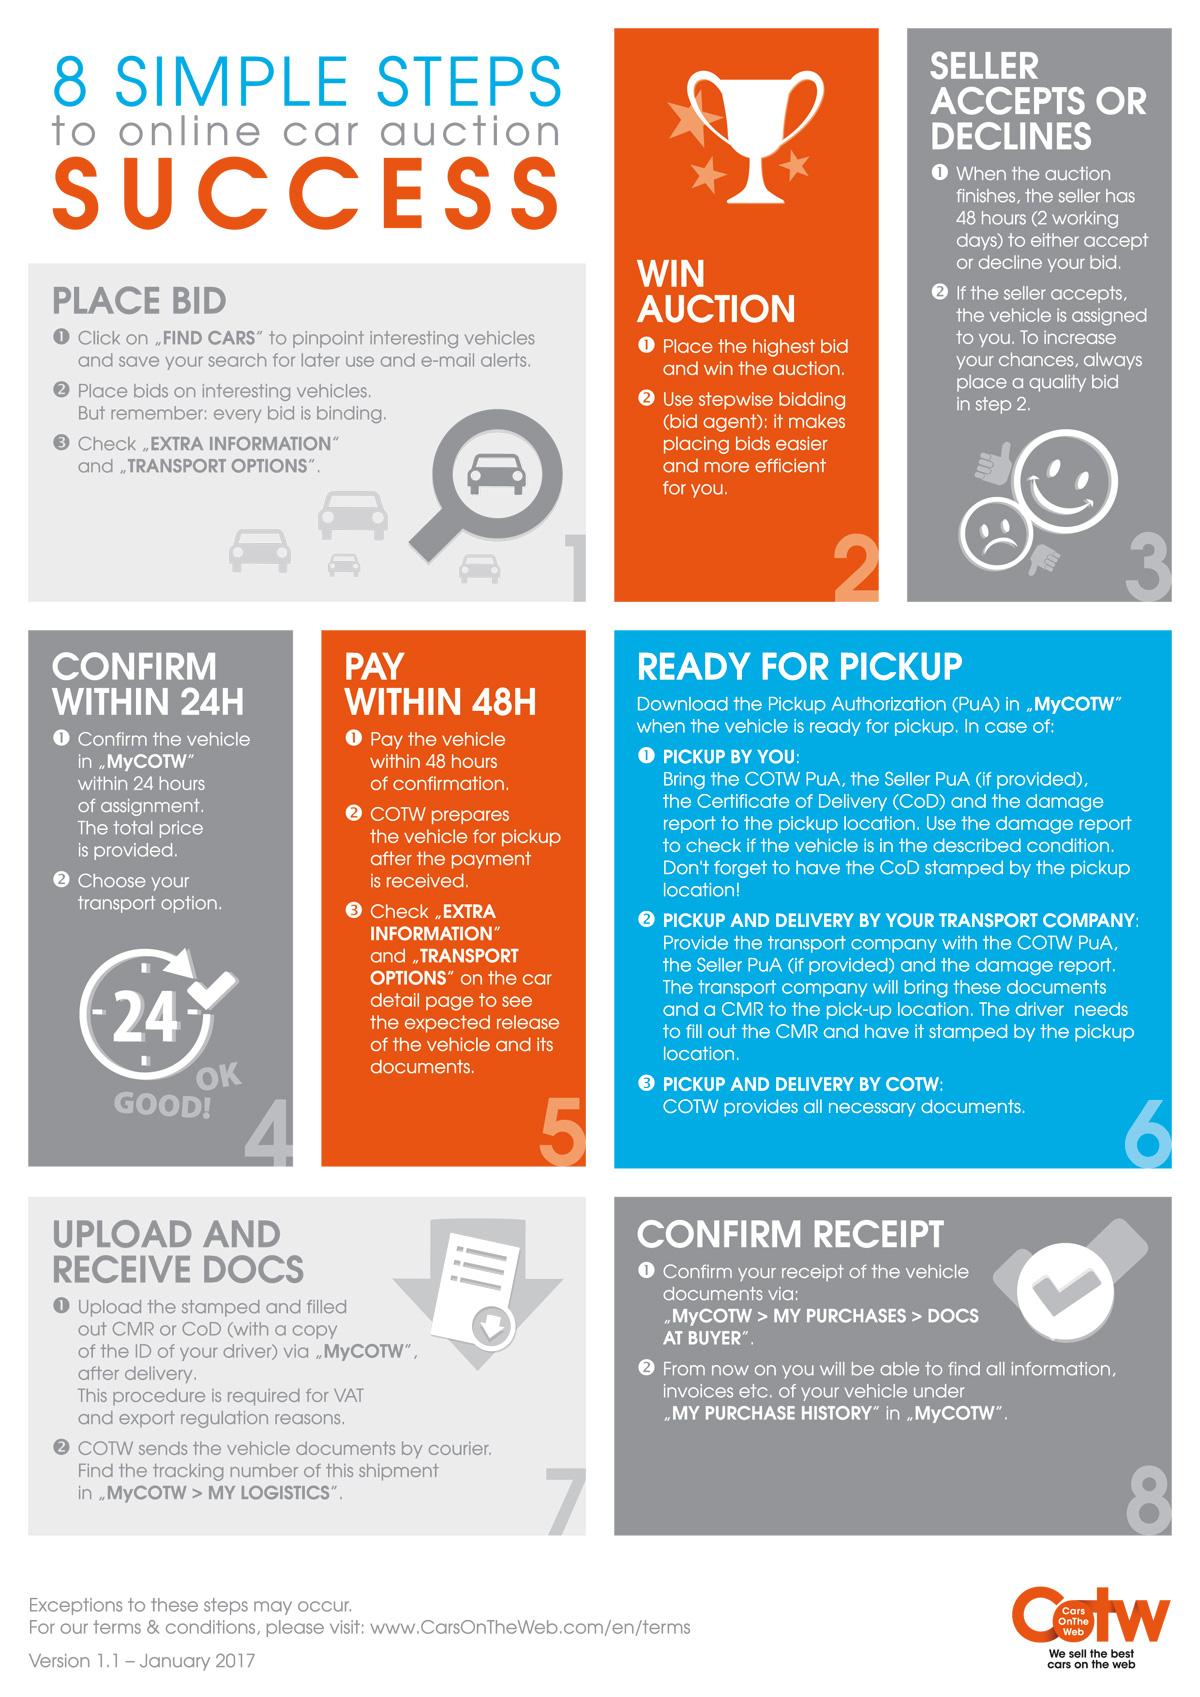 8 simple steps